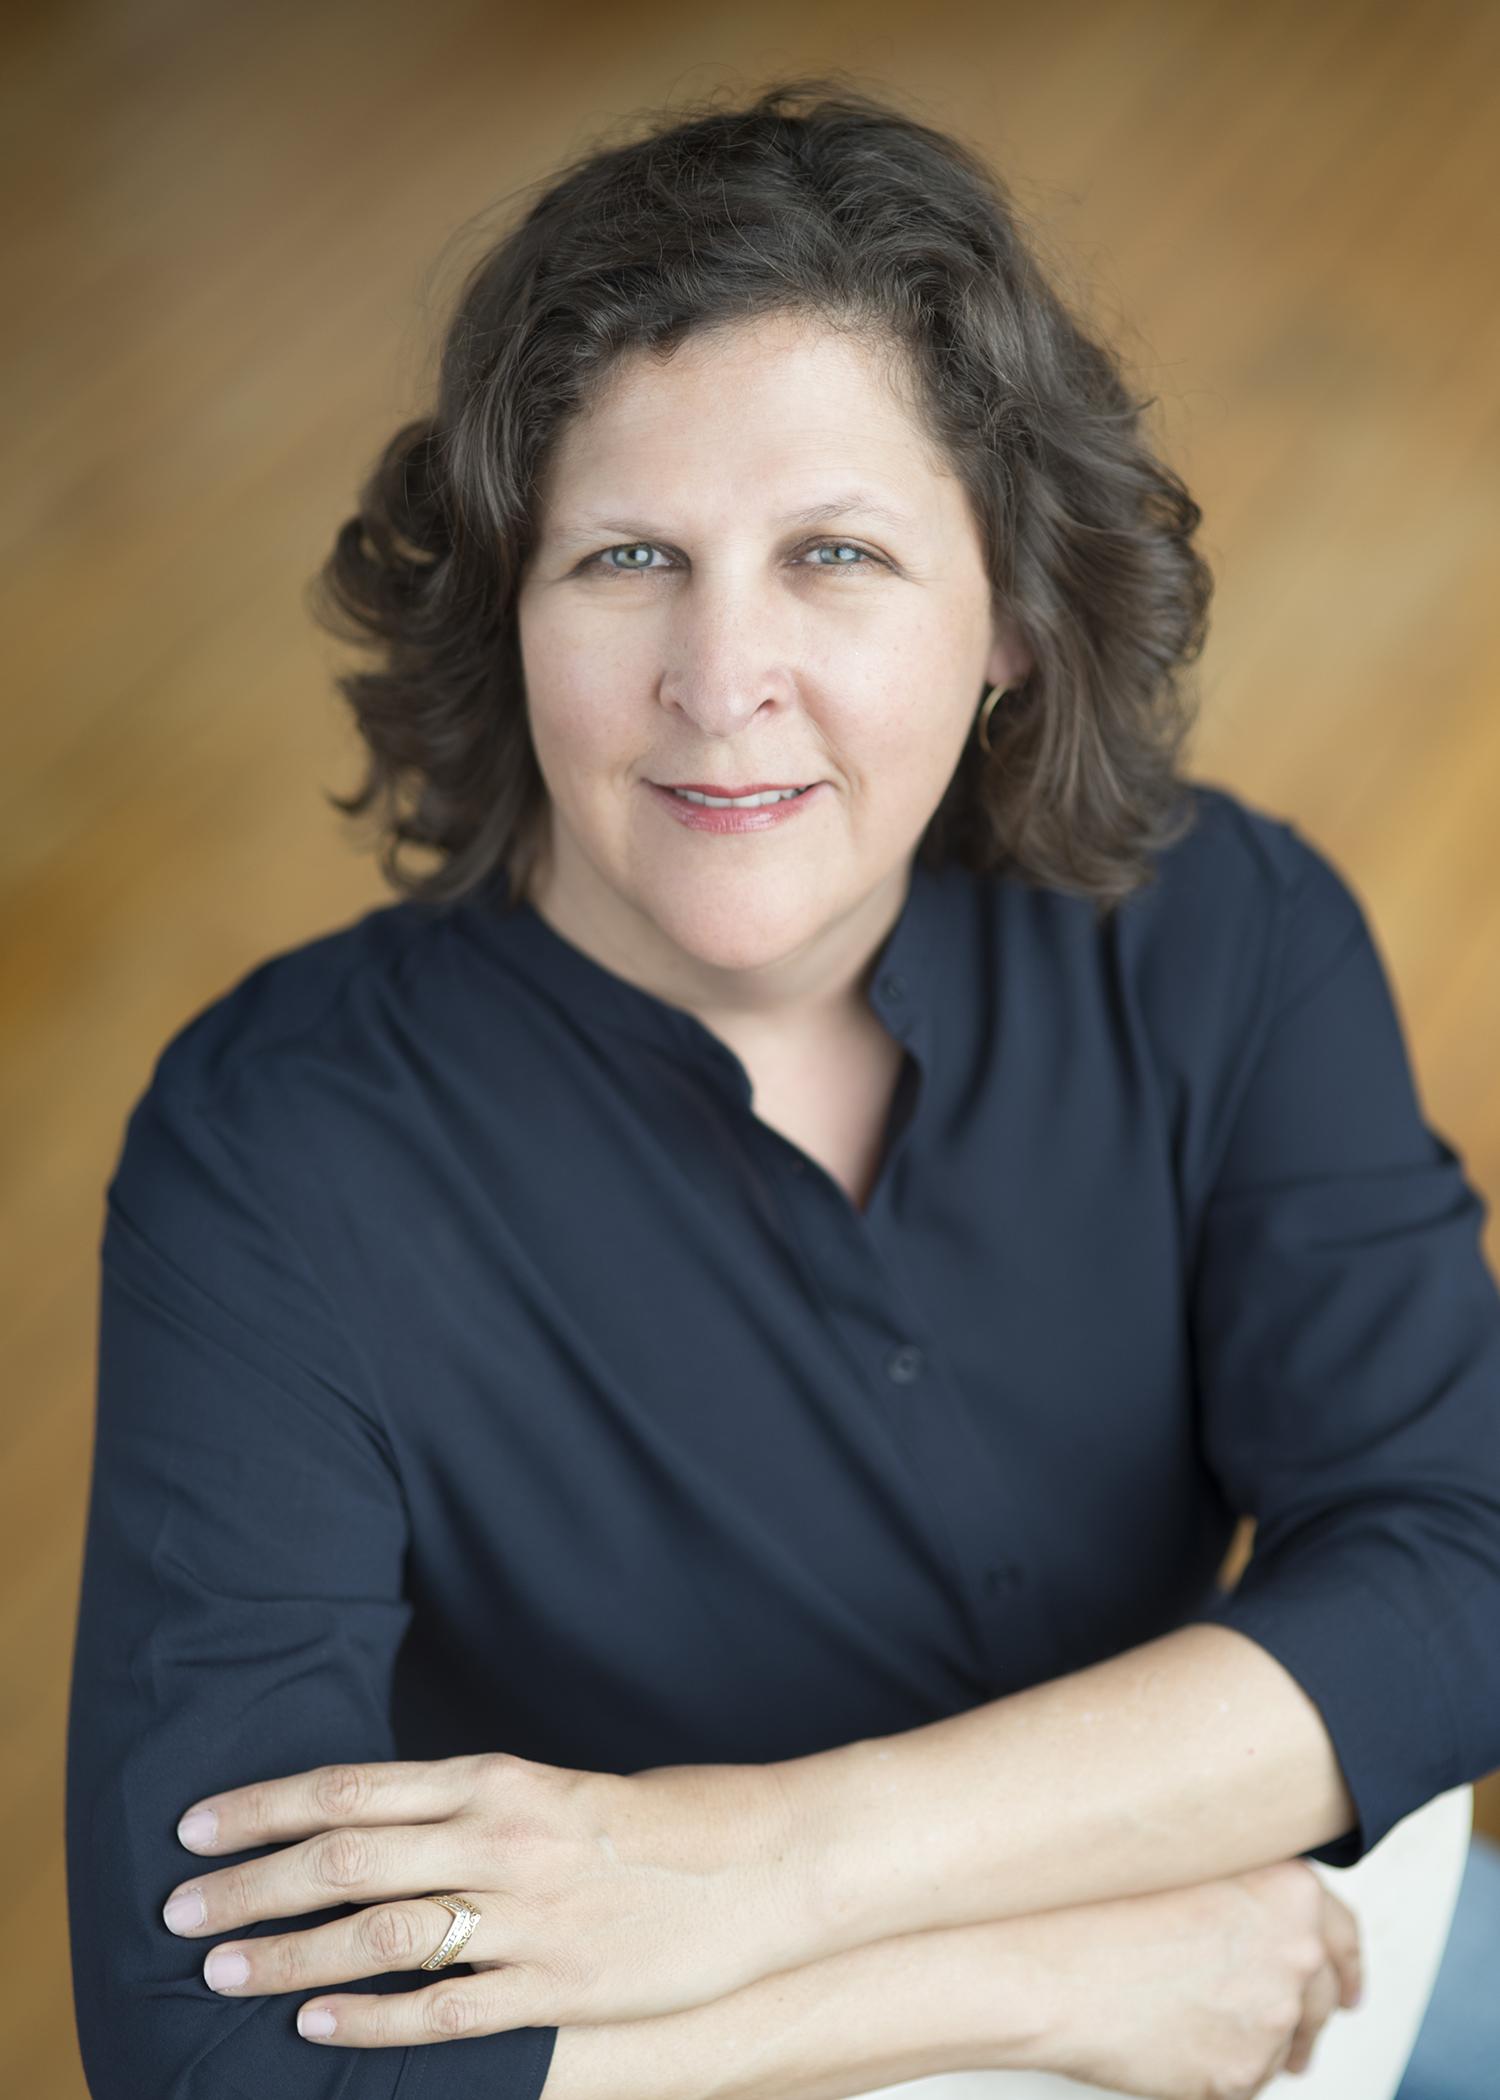 Michelle Goitia, owner  Photo Courtesy of Hartshorn Portraiture